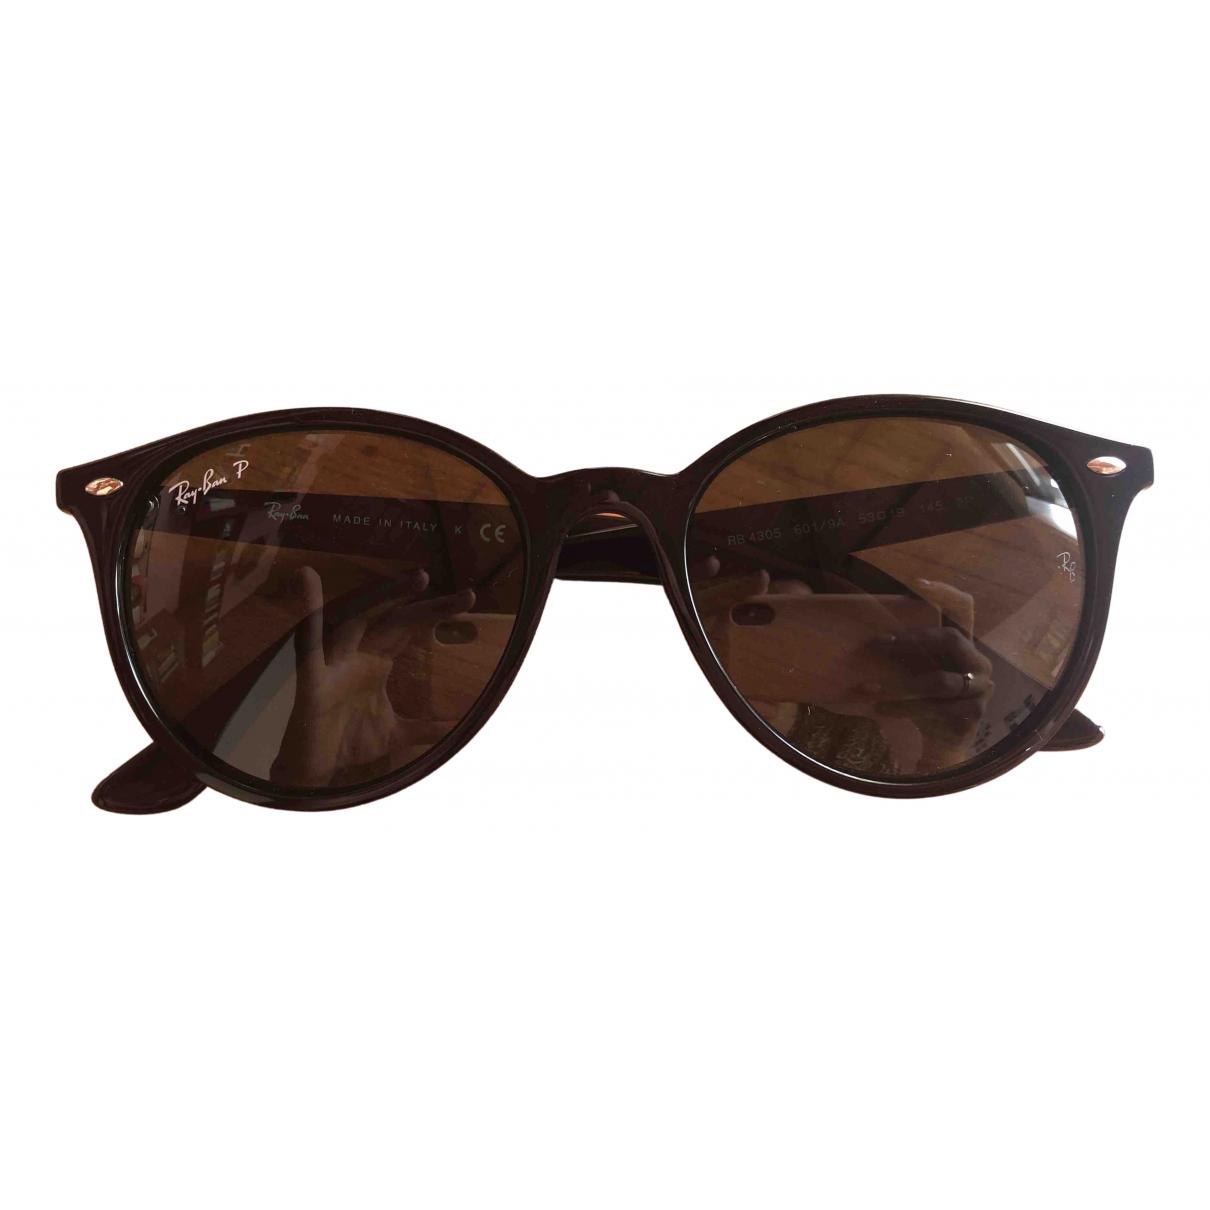 Ray-ban N Black Sunglasses for Men N